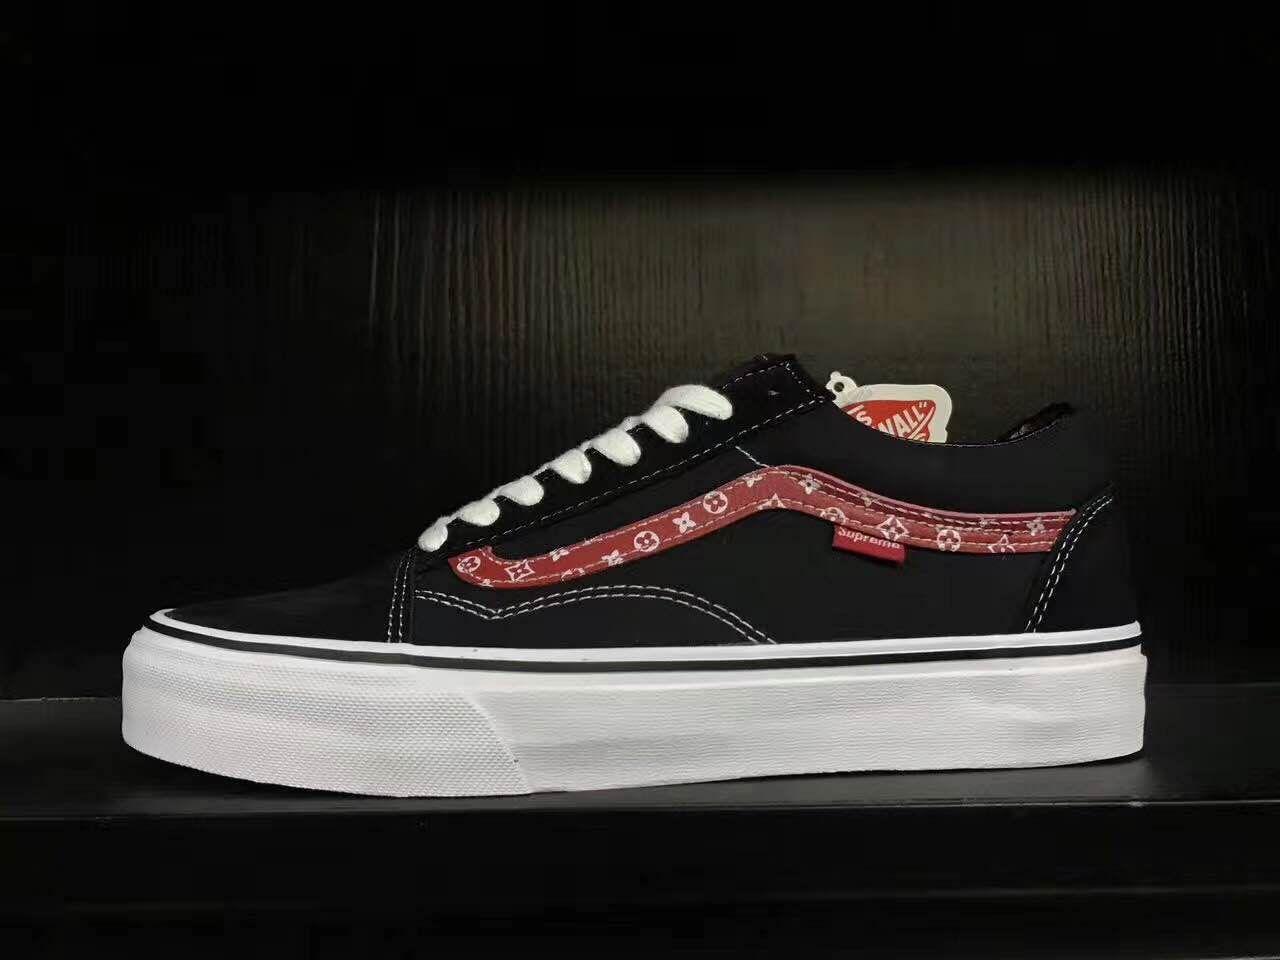 Supreme X Vans Old Skool Black White Red Skate Shoes #Vans